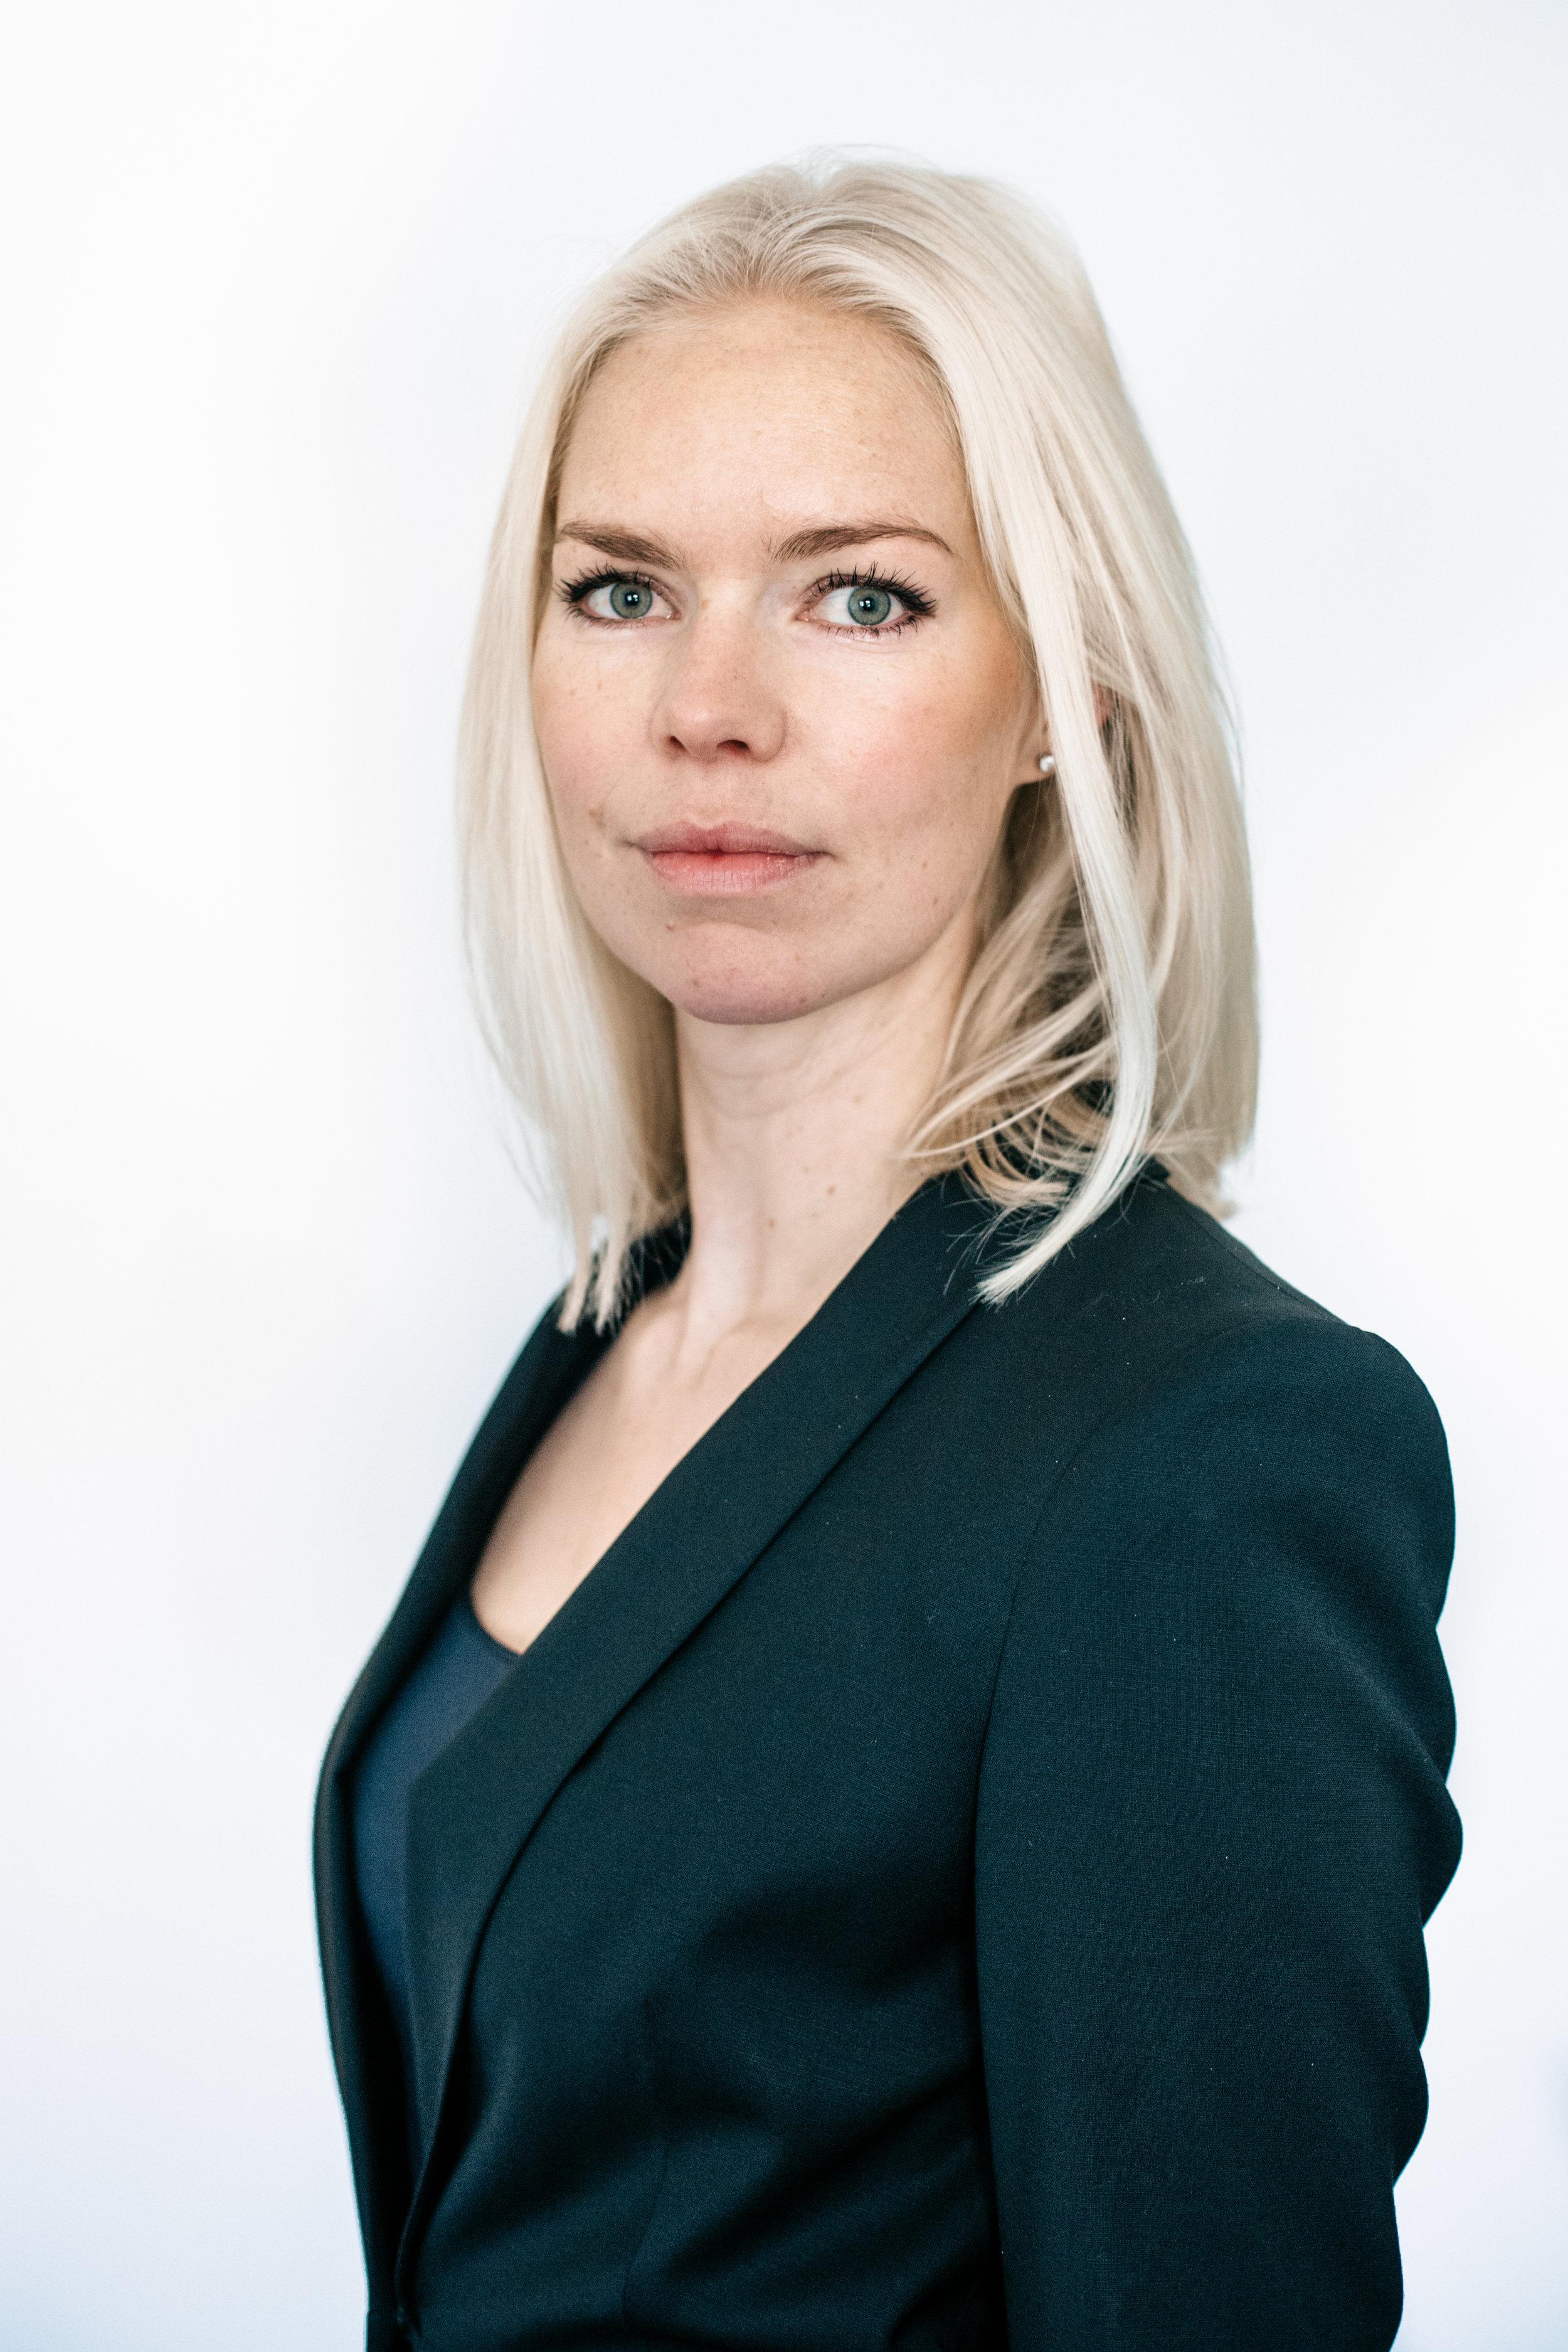 Foto: Marte Vike Arnesen  Epost:  anna@graasvold-stenvaag.no   Telefon: 22 94 32 10  Faks: 22 94 32 19